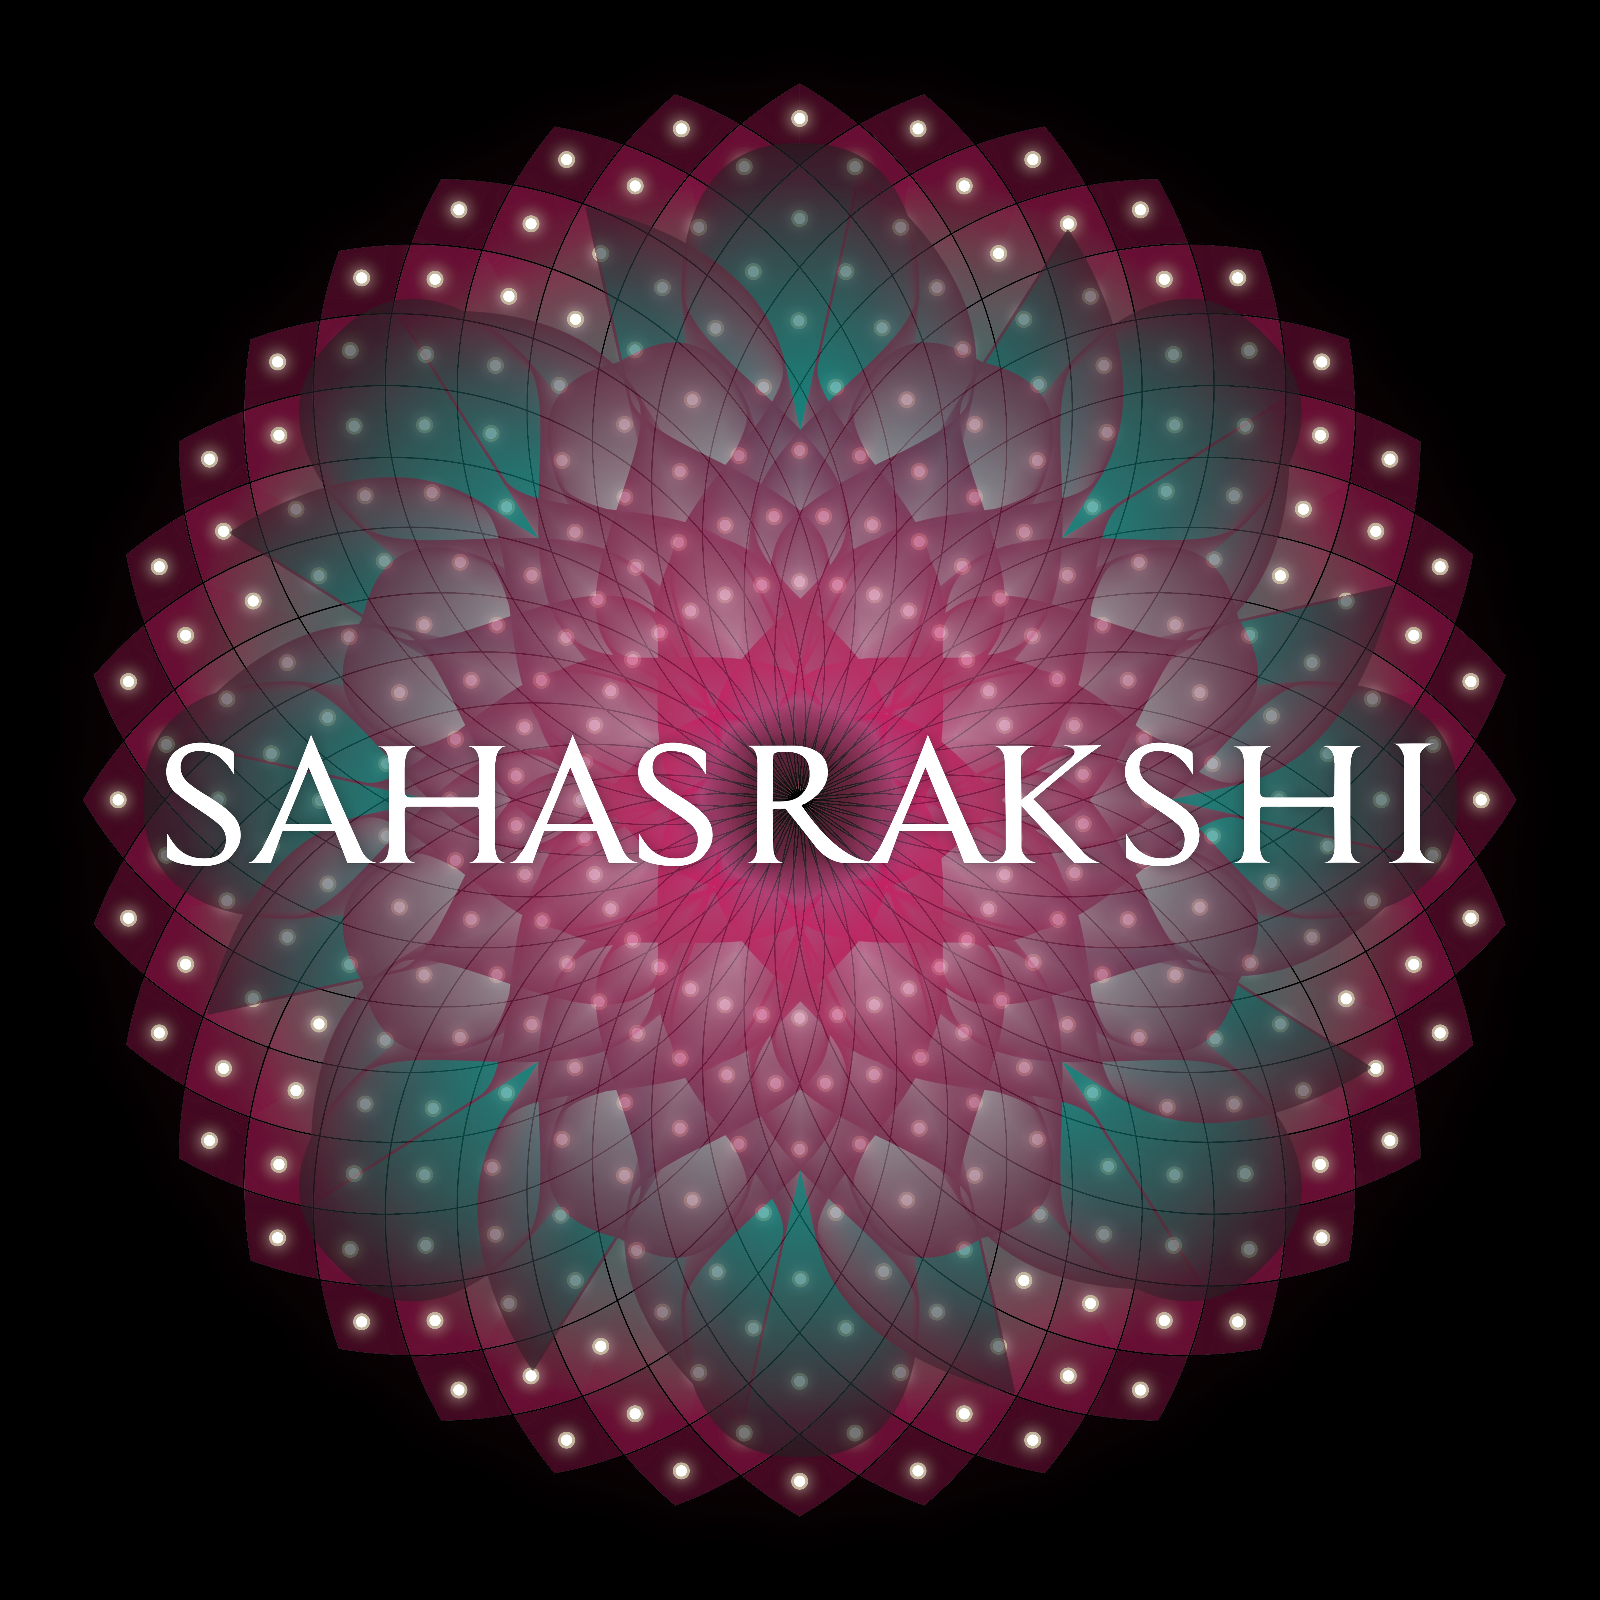 About Sahasrakshi